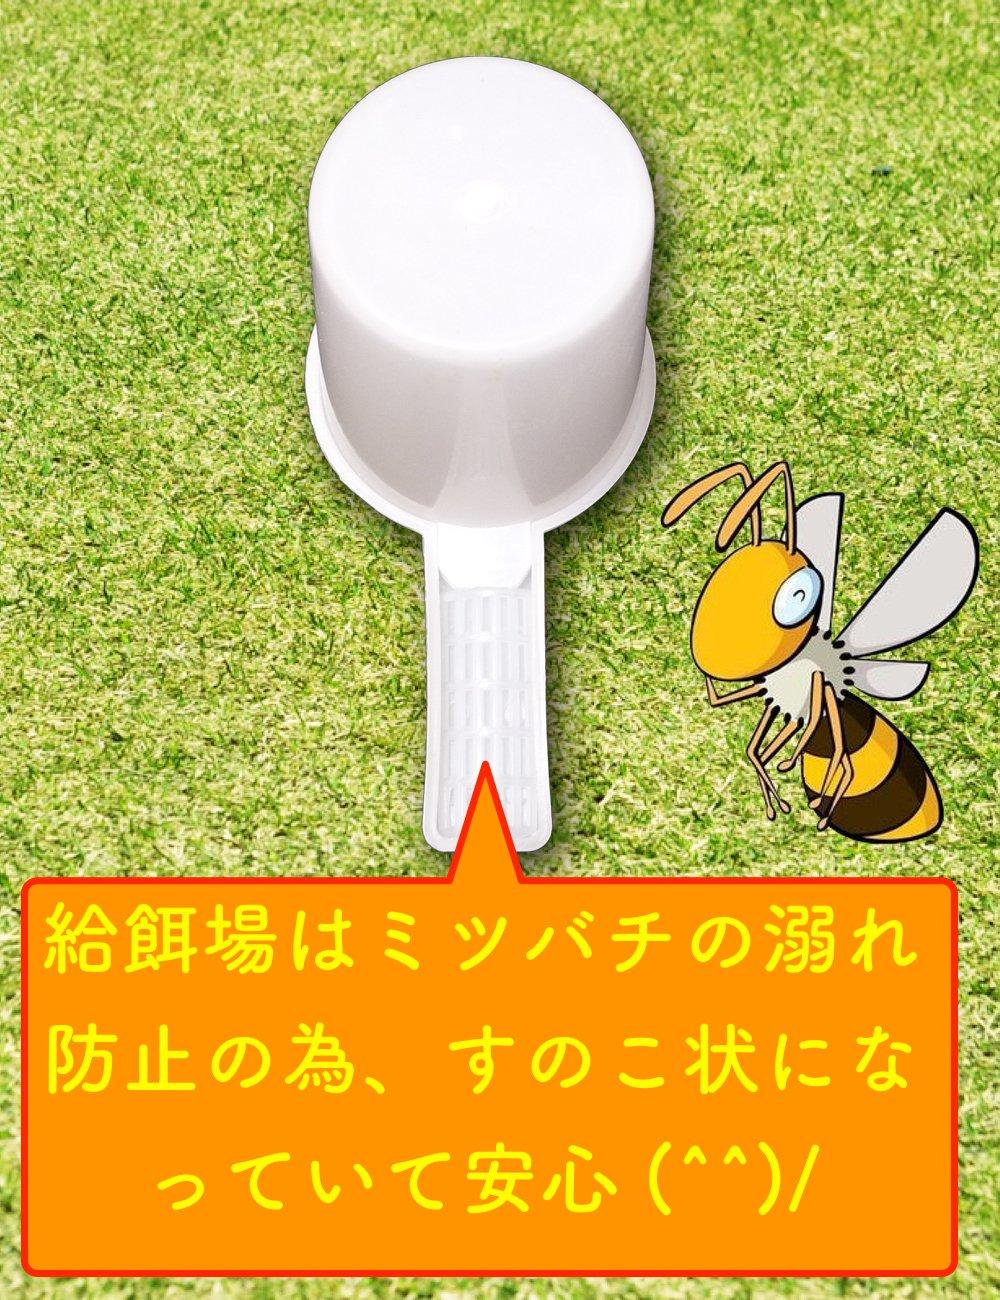 Design; Honey Bee Guard 12mm Open Centre Novel In